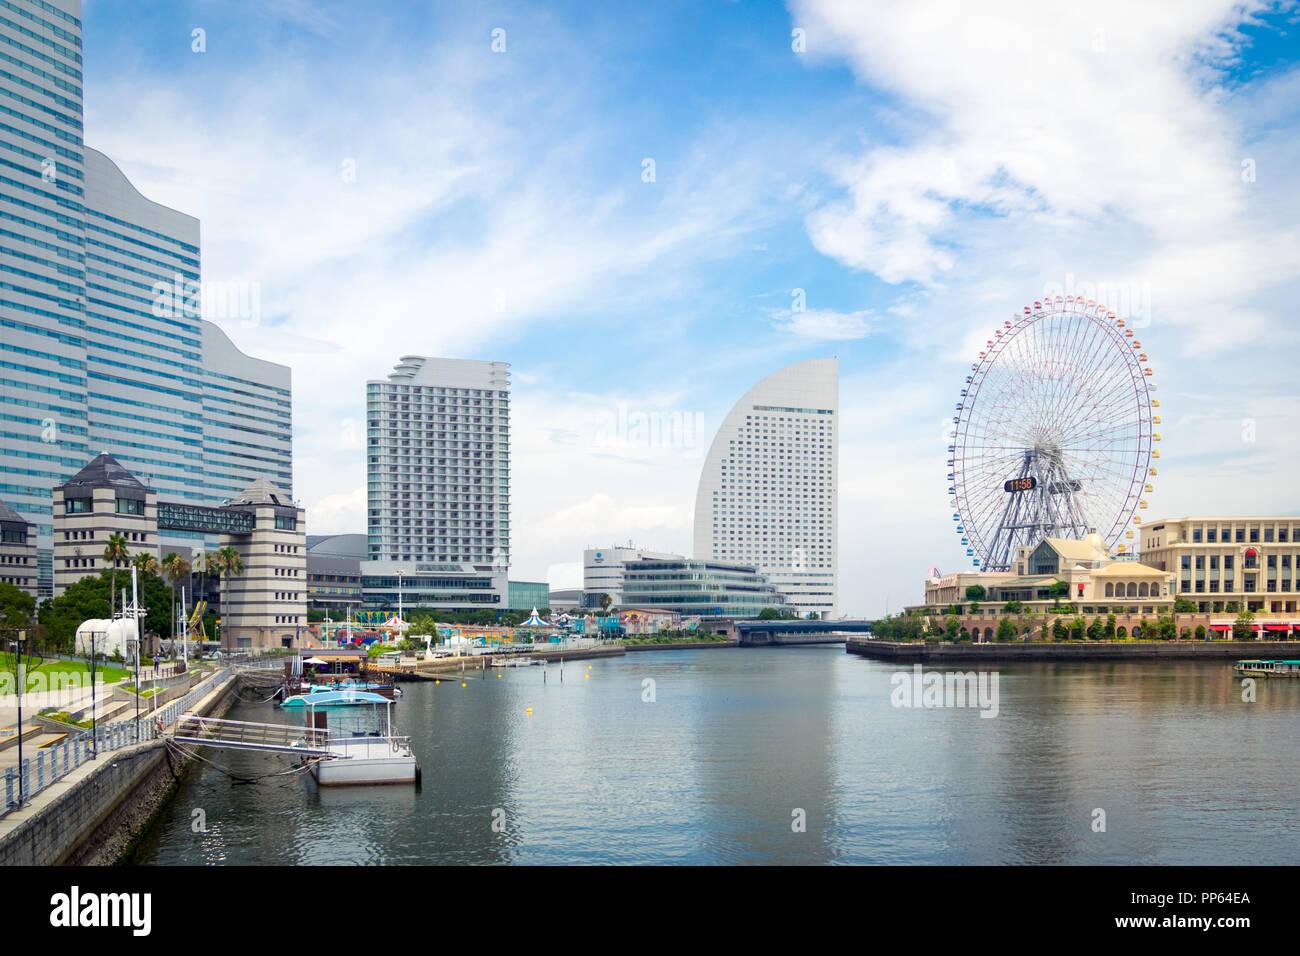 The beautiful Yokohama skyline and Yokohama waterfront at Minato-Mirai, and the Cosmo Clock 21 Ferris wheel Yokohama, Kanagawa Prefecture, Japan. Stock Photo